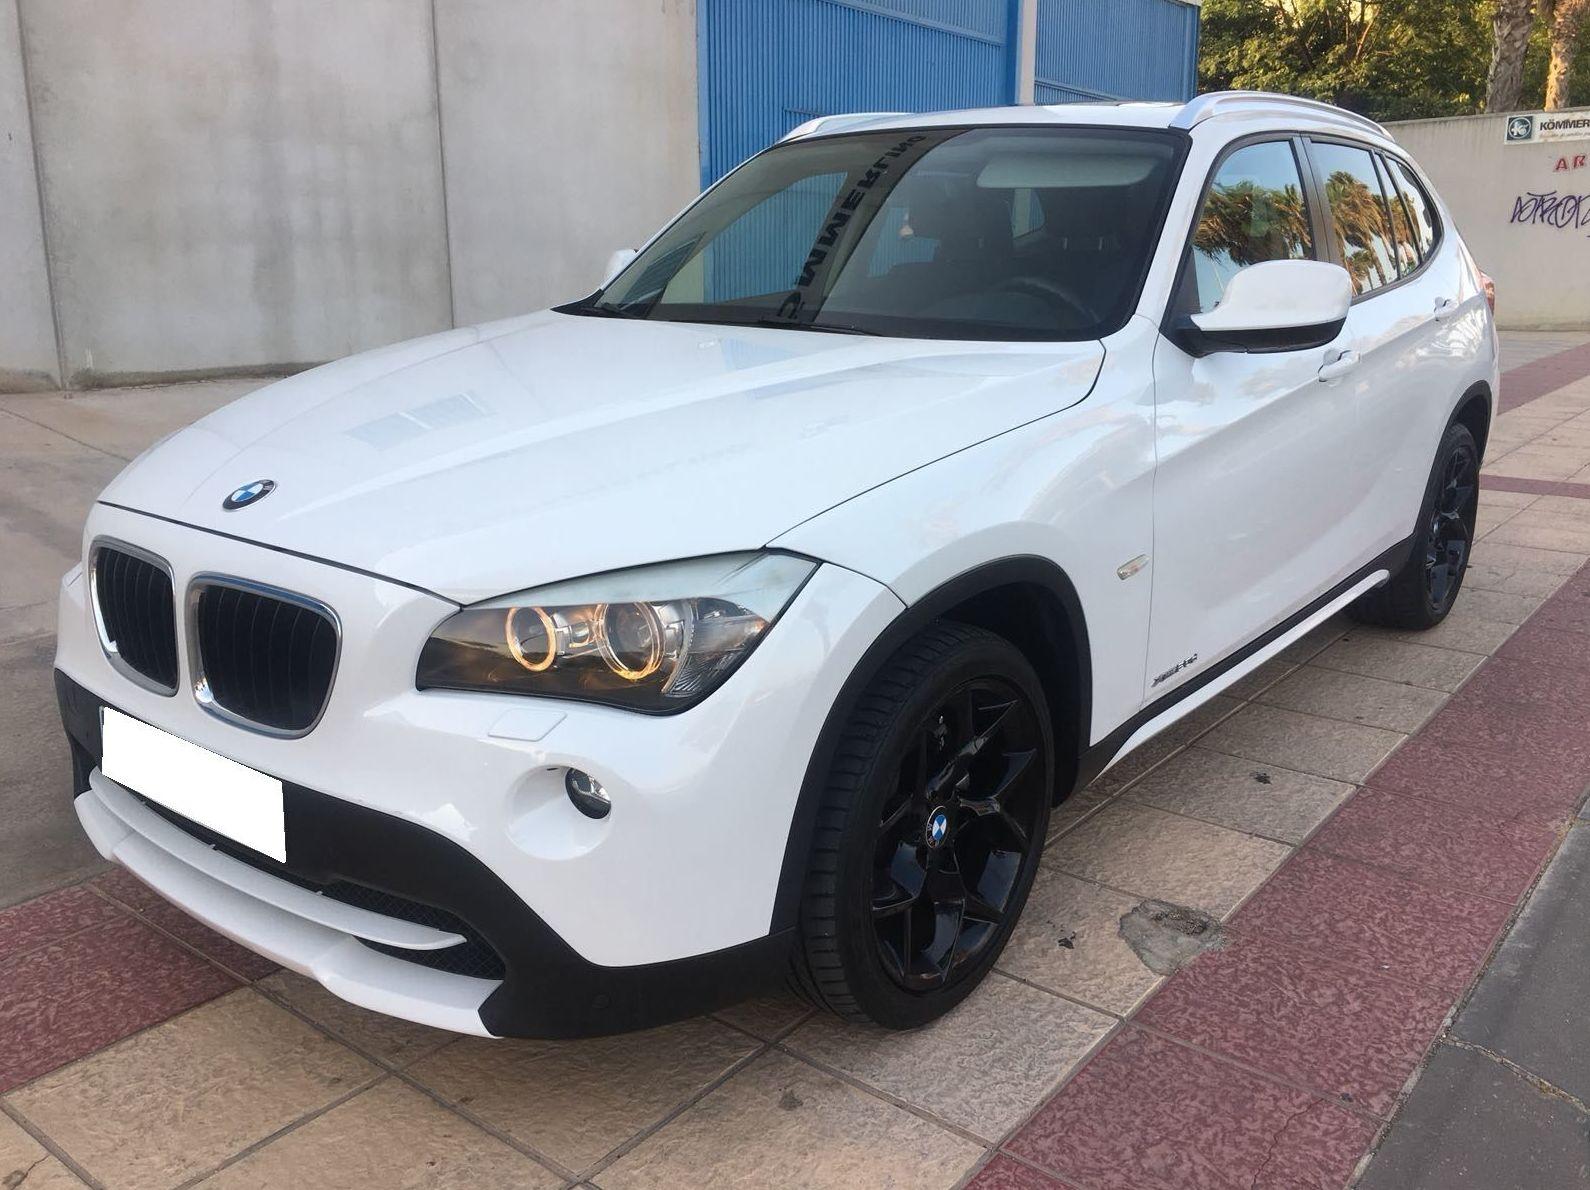 BMW X1: COCHES DE OCASION de Navirent-Automóviles Parque Mediterráneo